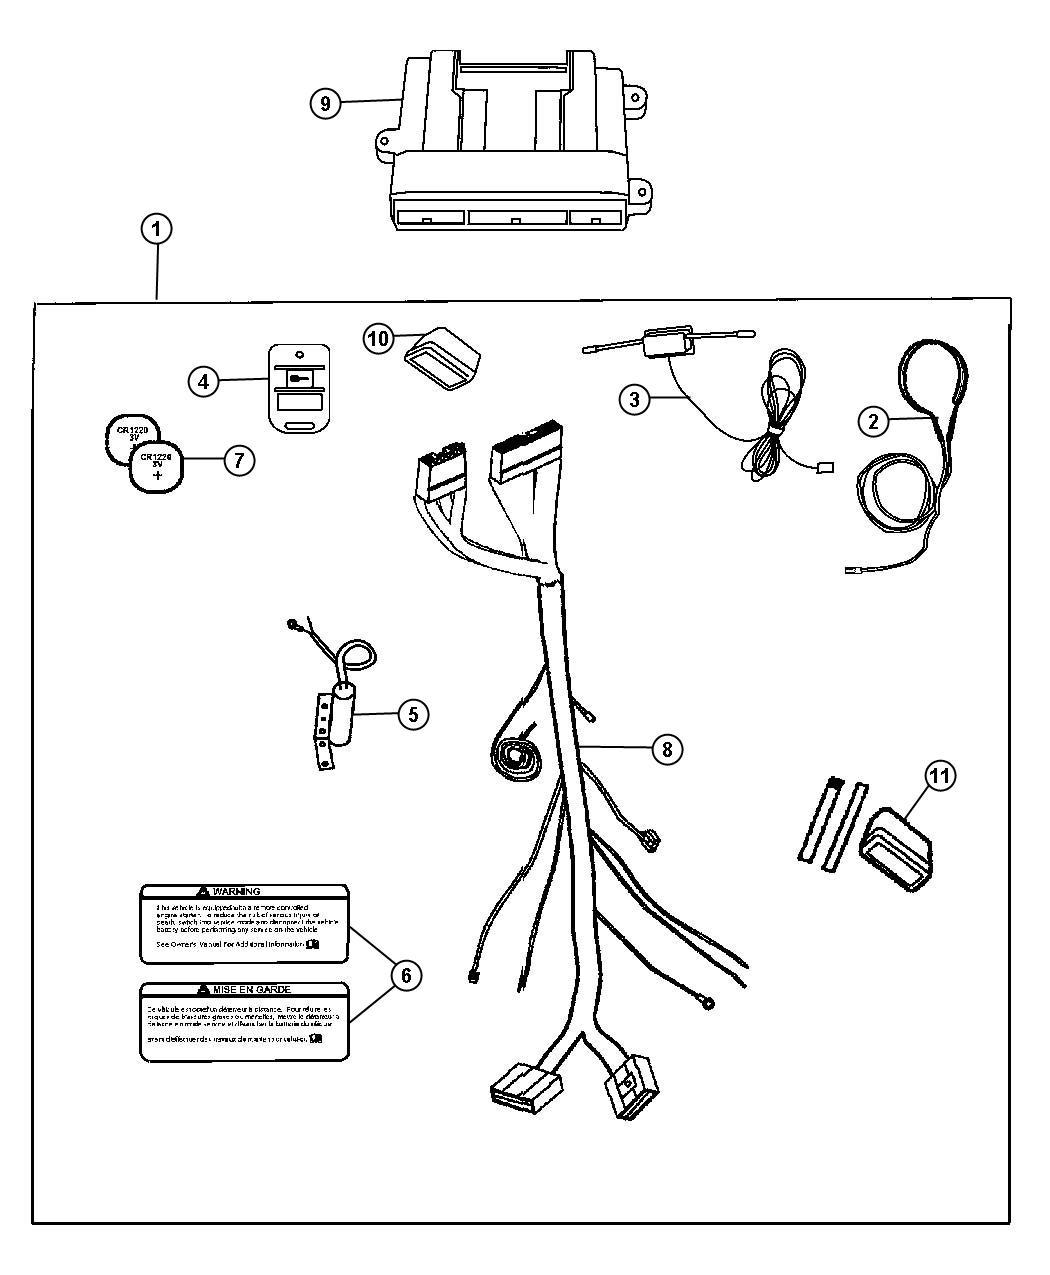 Dodge Grand Caravan Remote Start Installation Kit